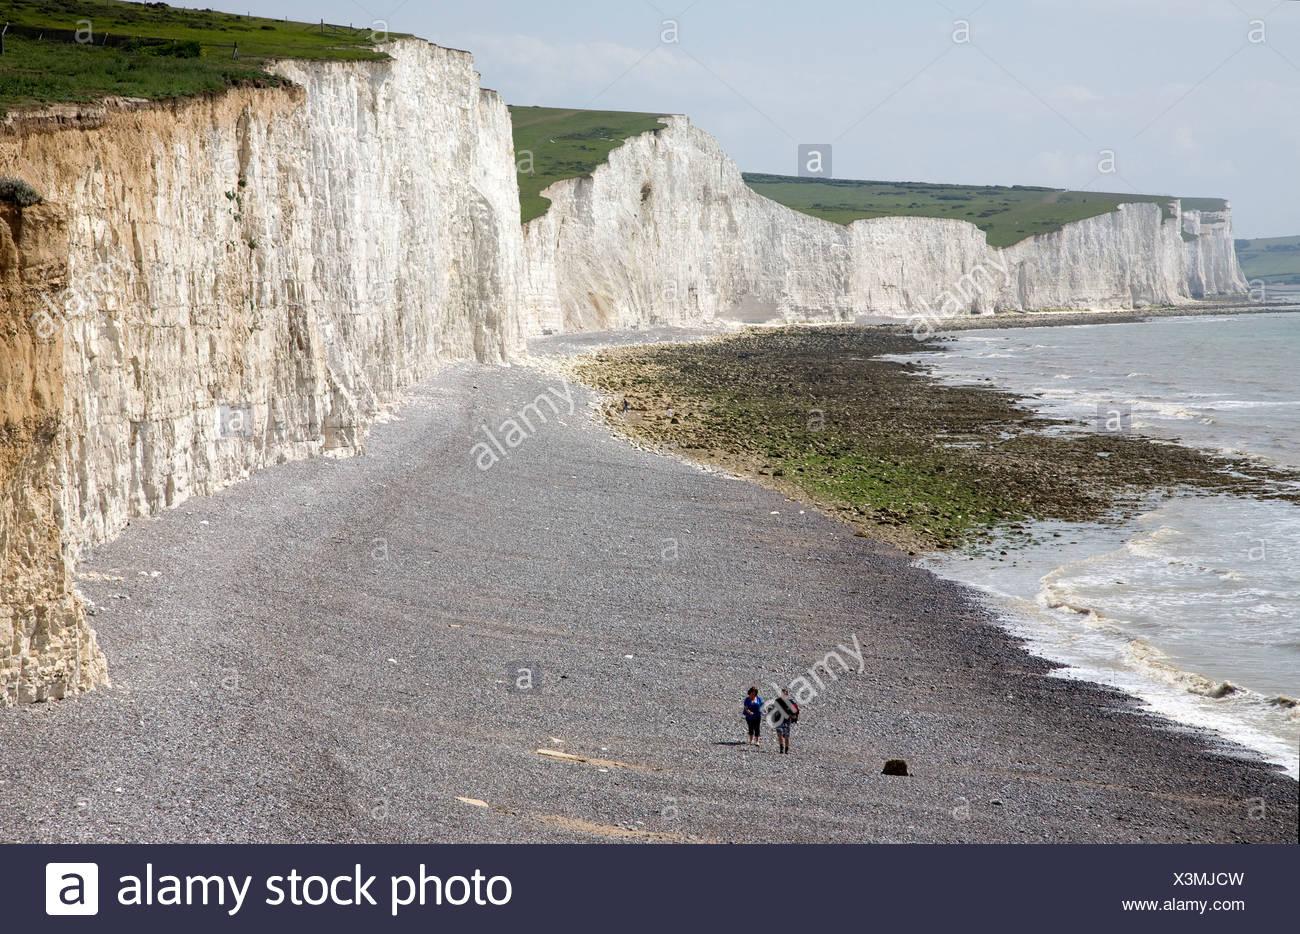 UK. England. Kent. Eastbourne. Chalk cliffs and couple walking along pebble beach. - Stock Image